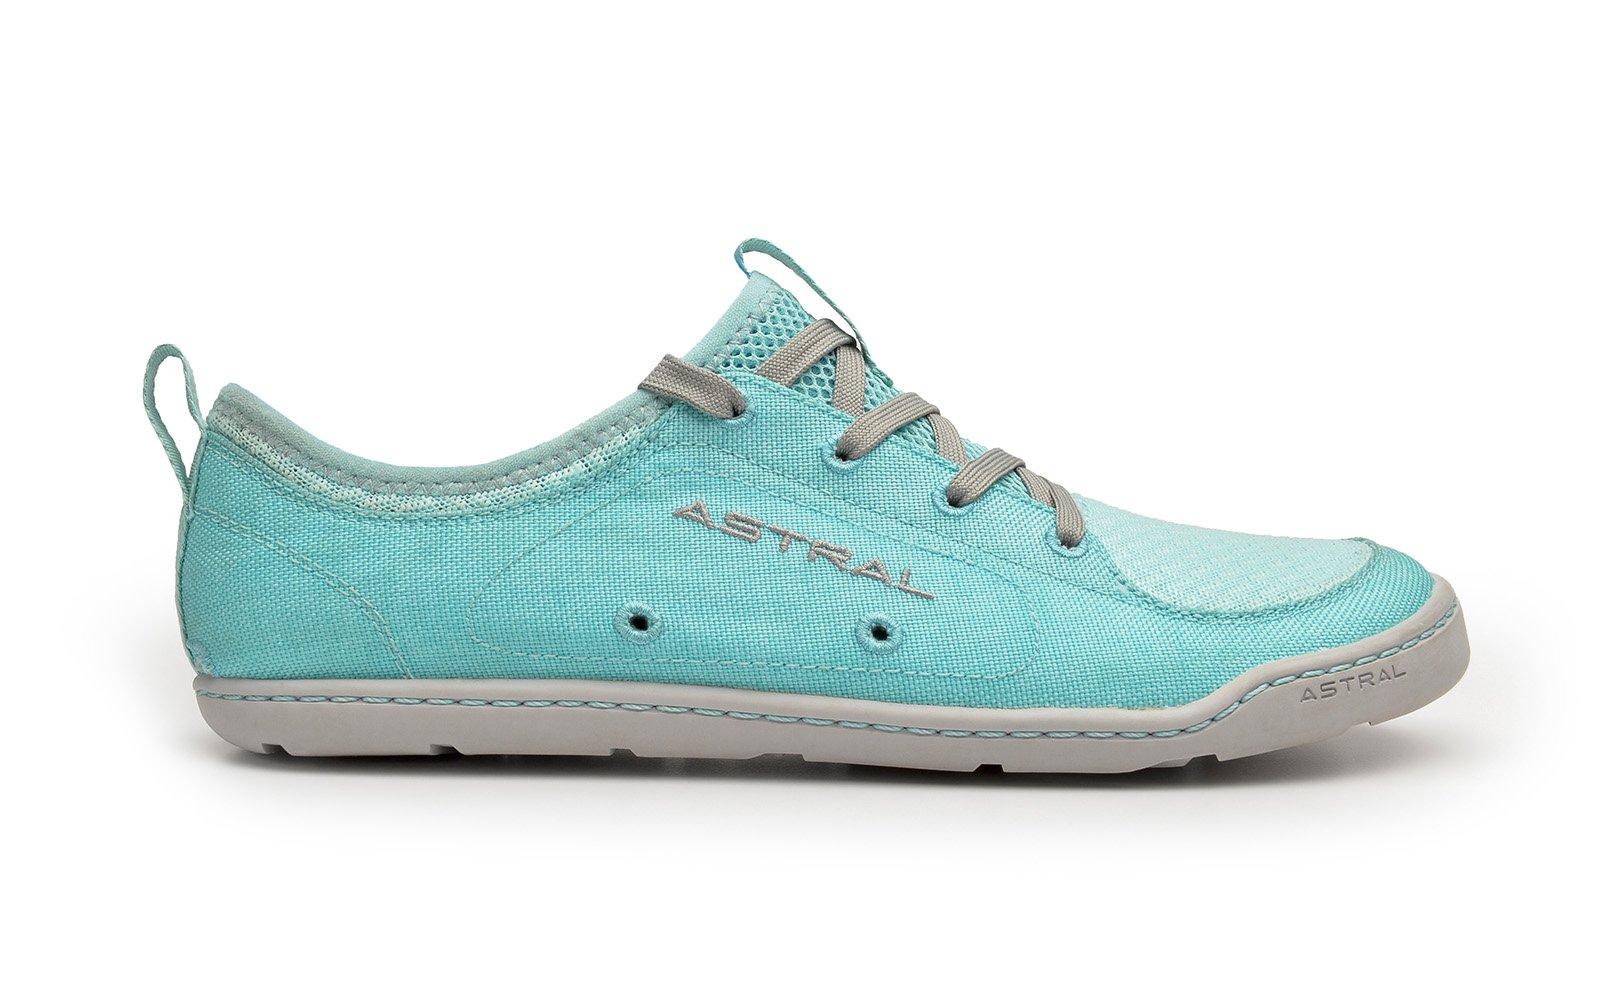 Astral Loyak Women's Water Shoe - Turquoise/Gray - 10